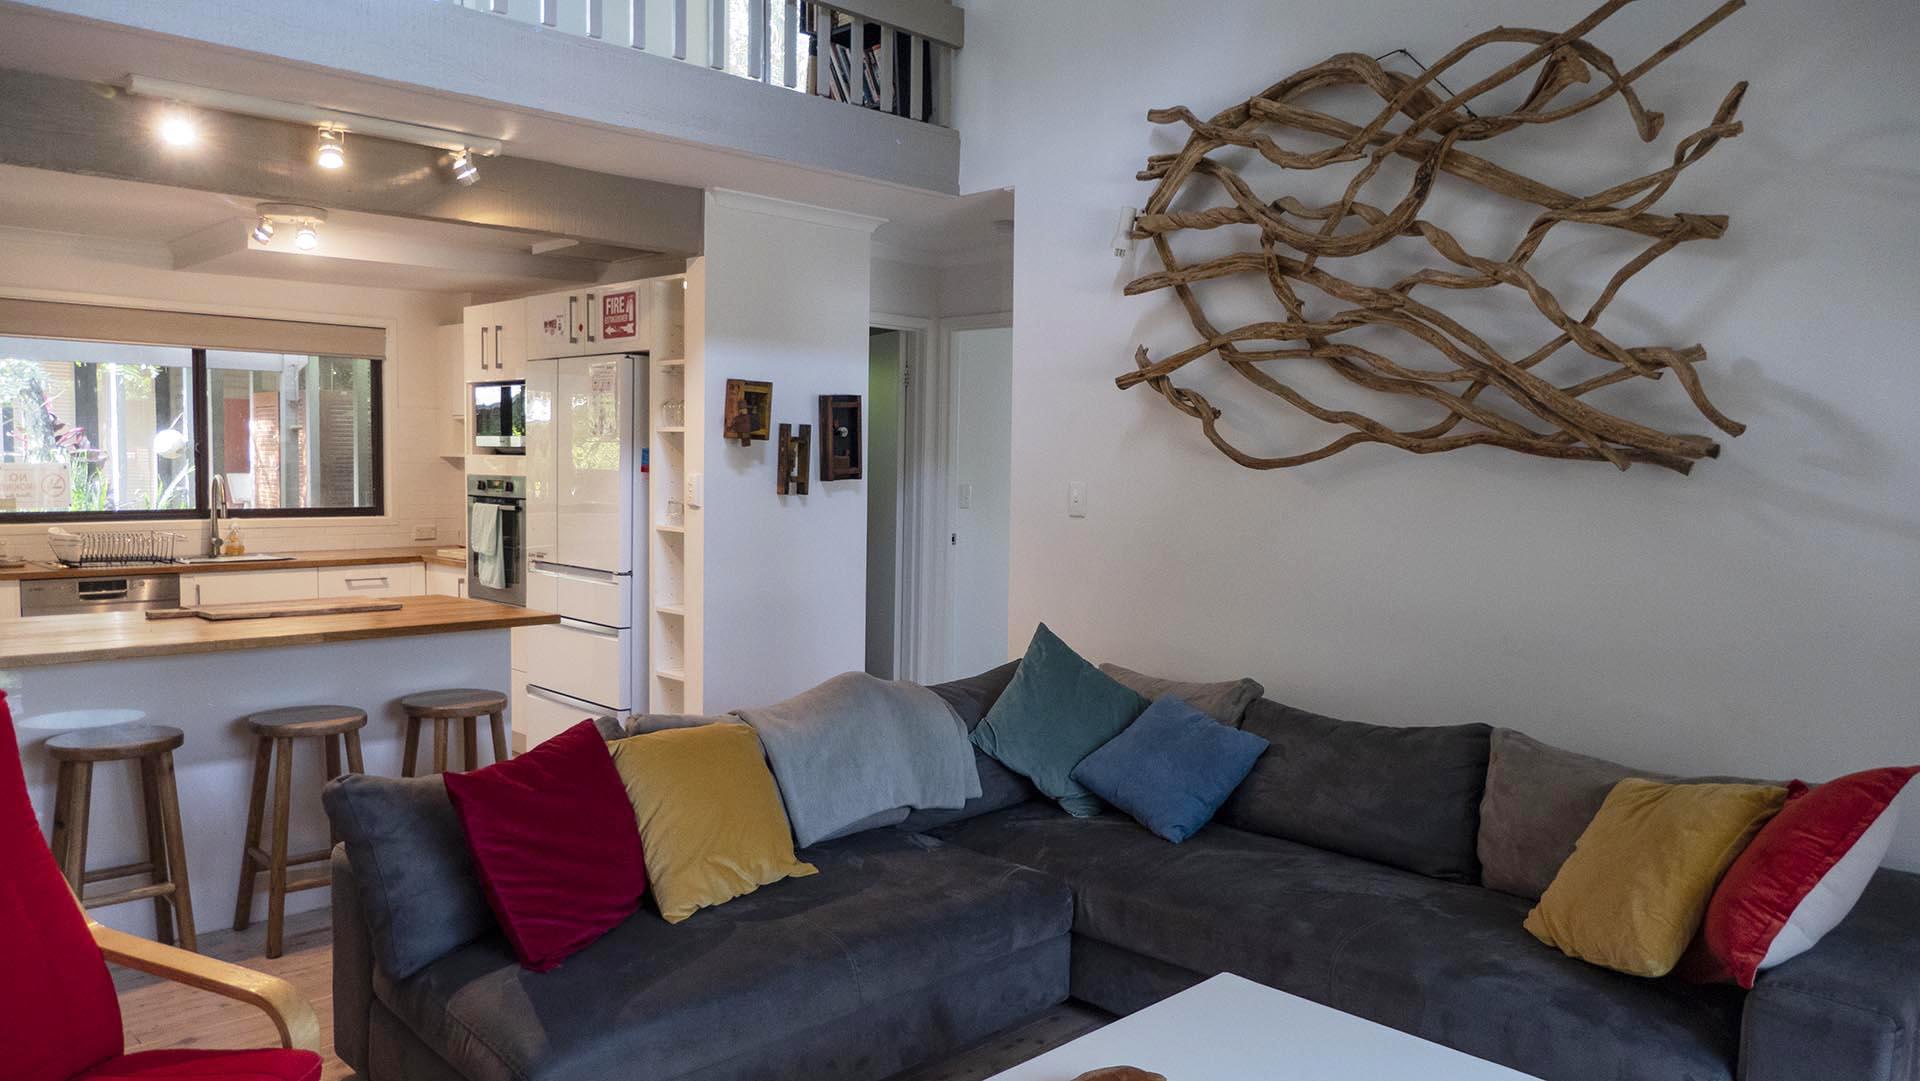 Copa Beachside Living Room adjacent to kitchen area